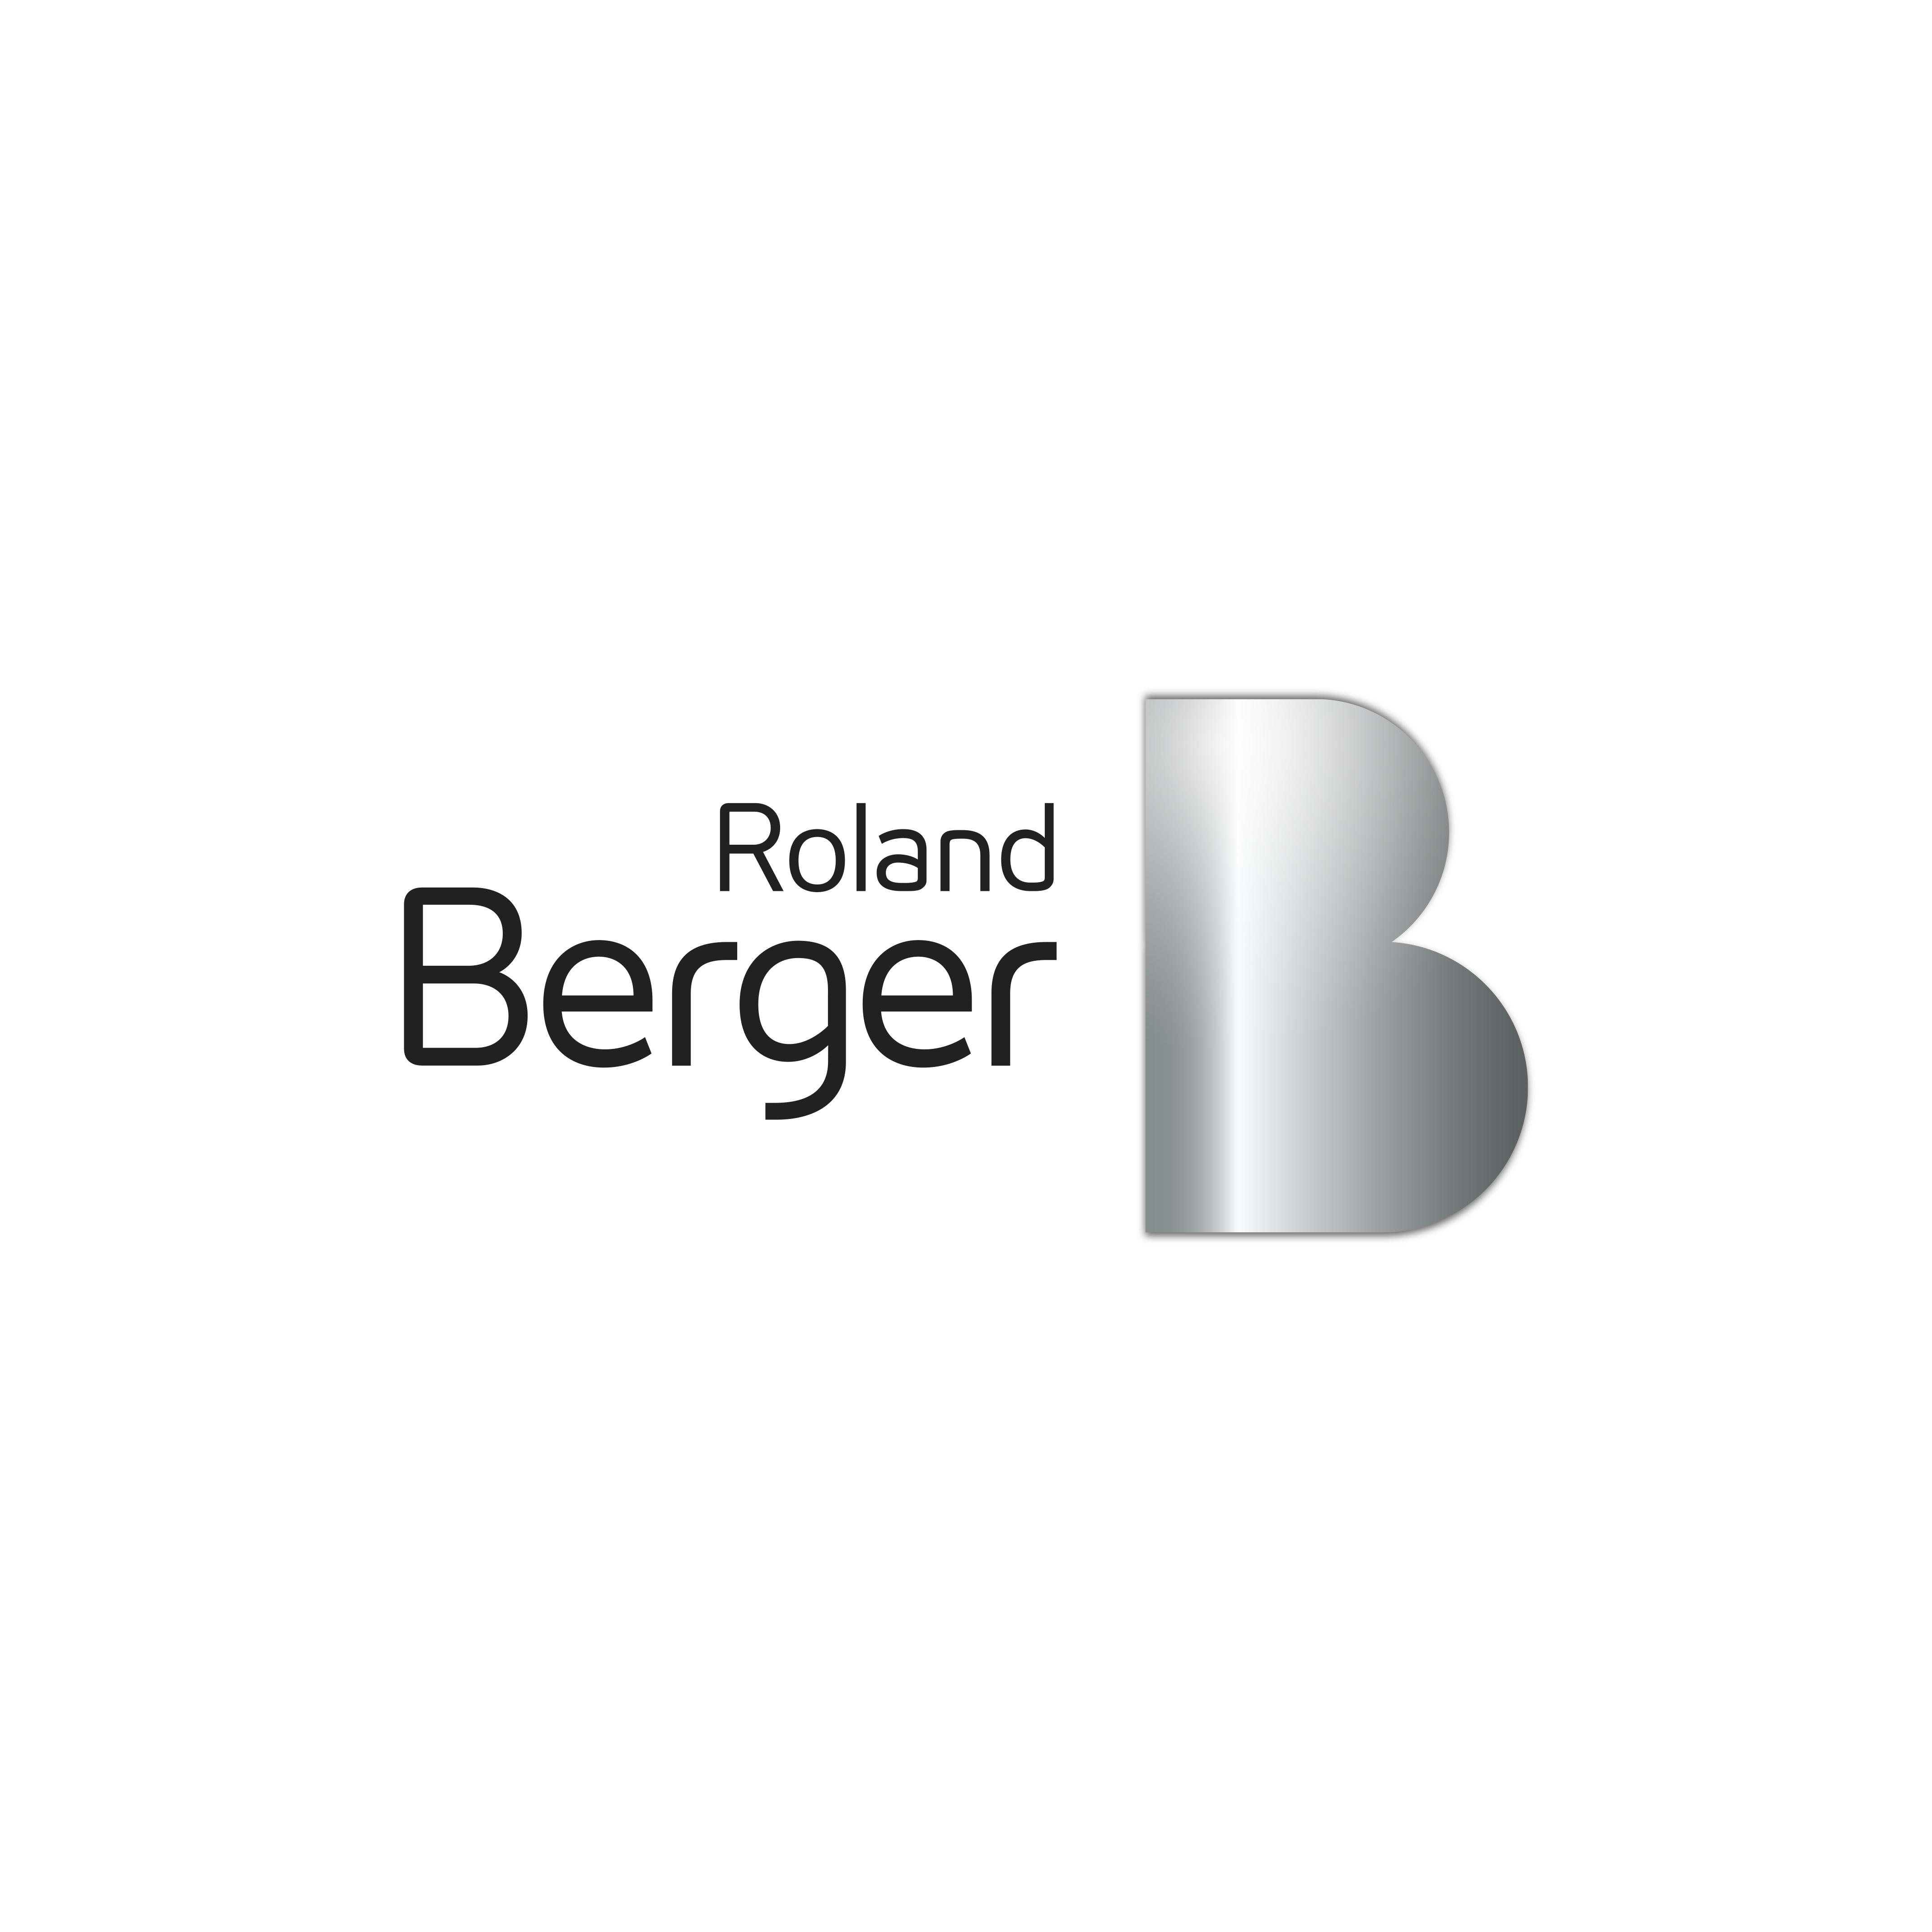 Roland Berger London